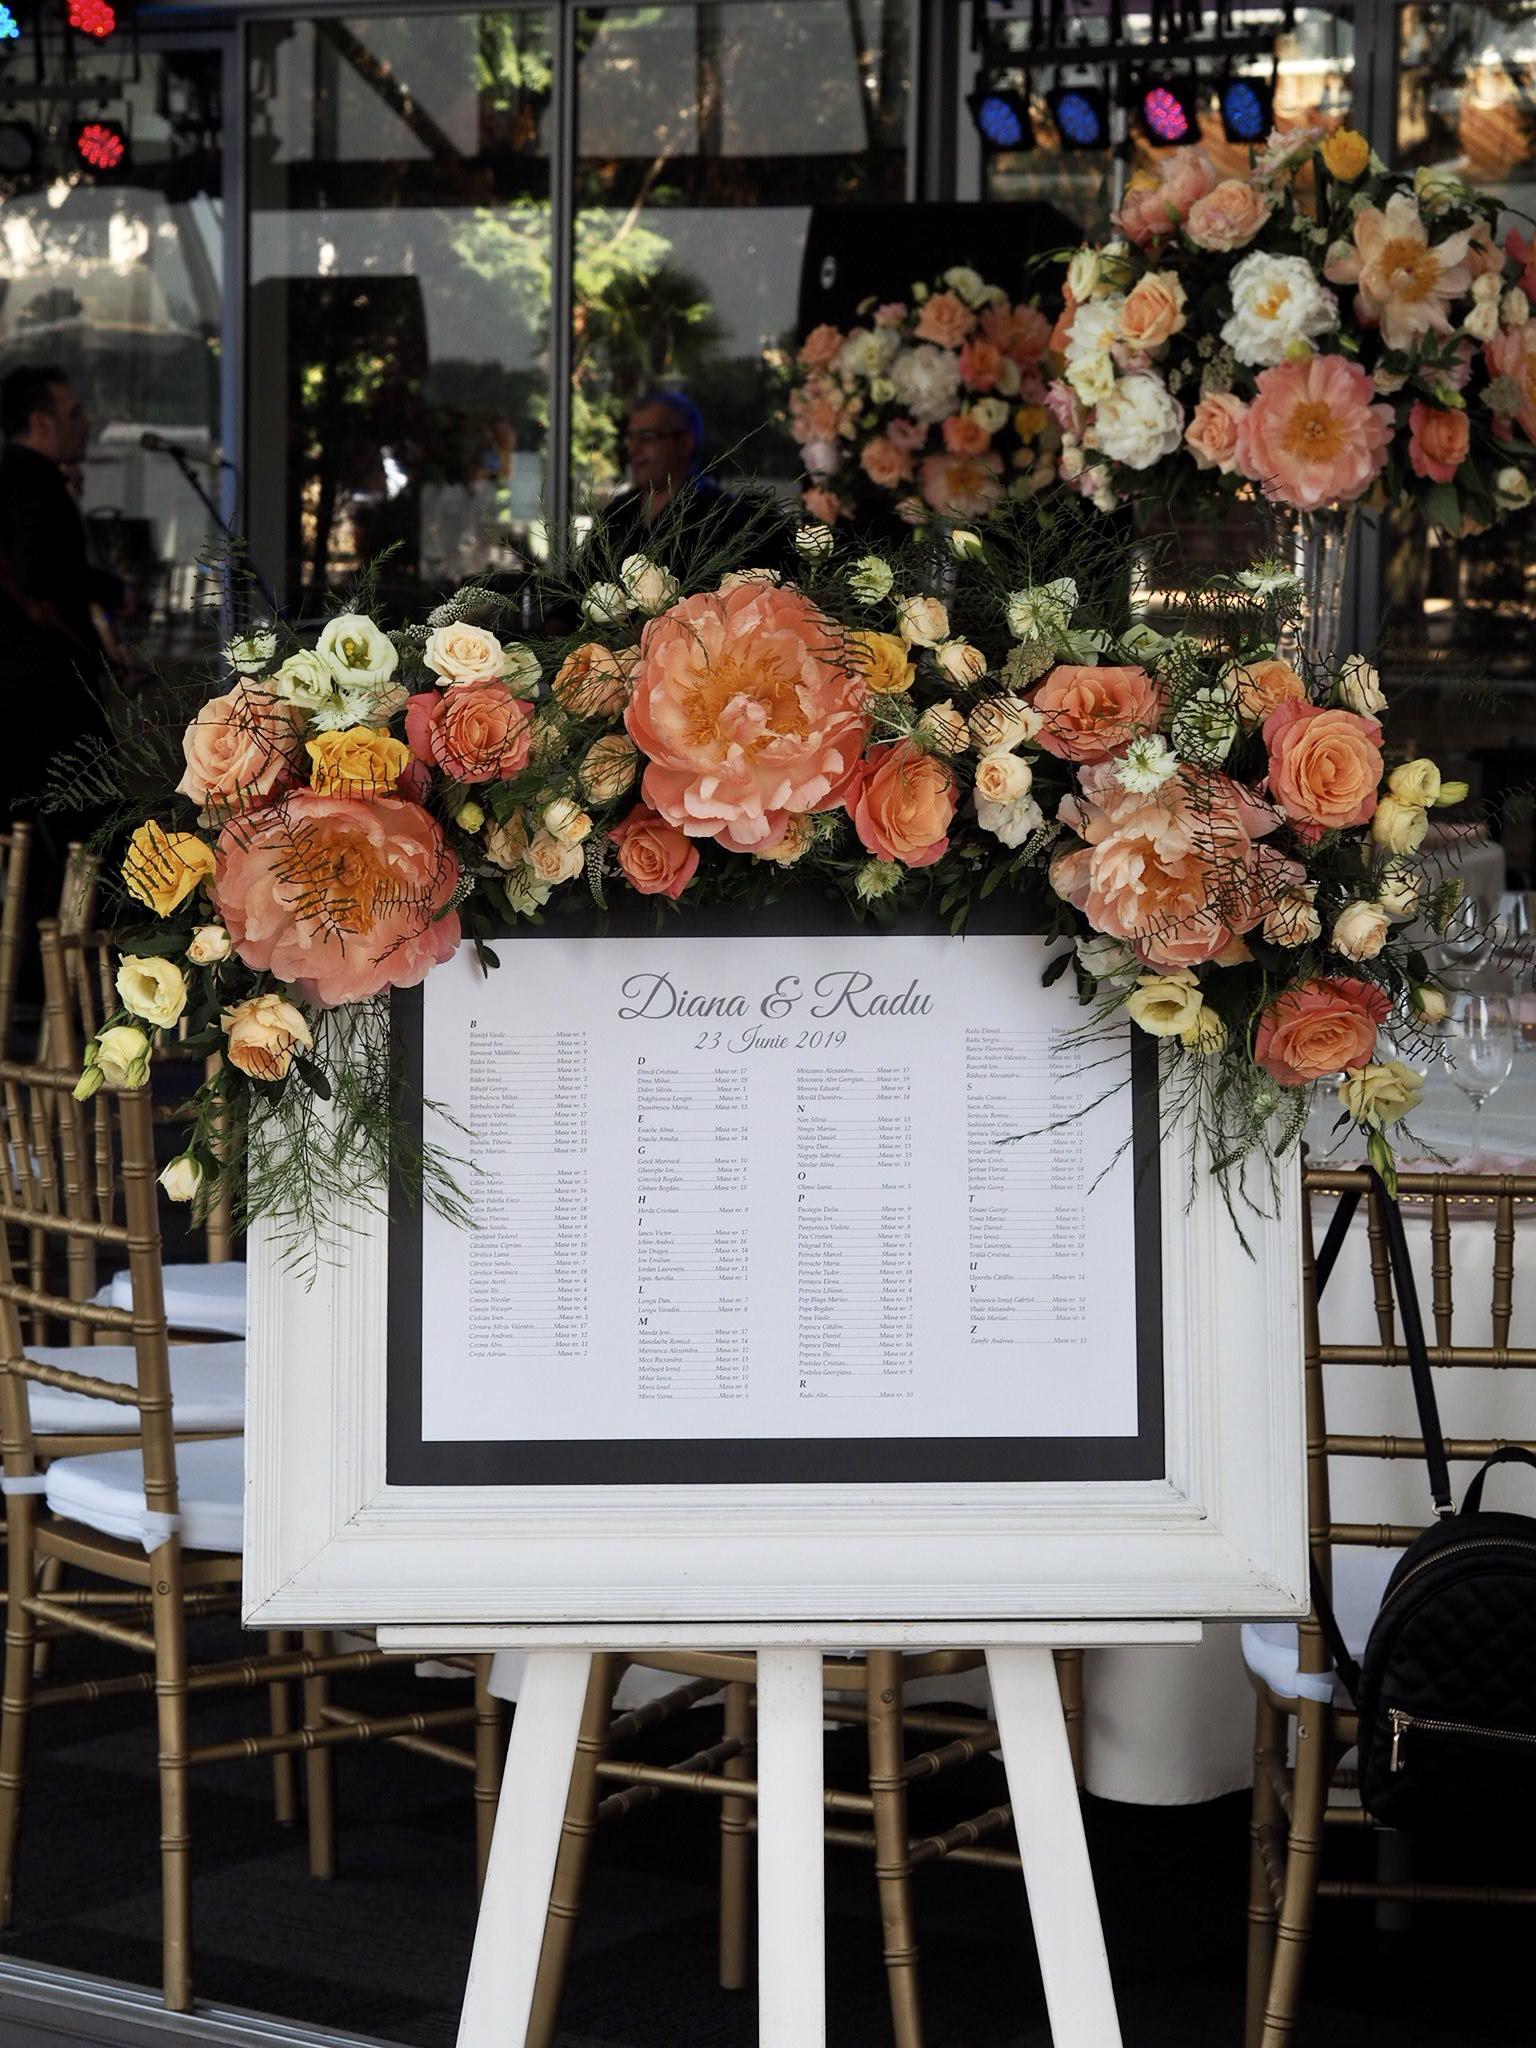 Sevalet decorat cu flori